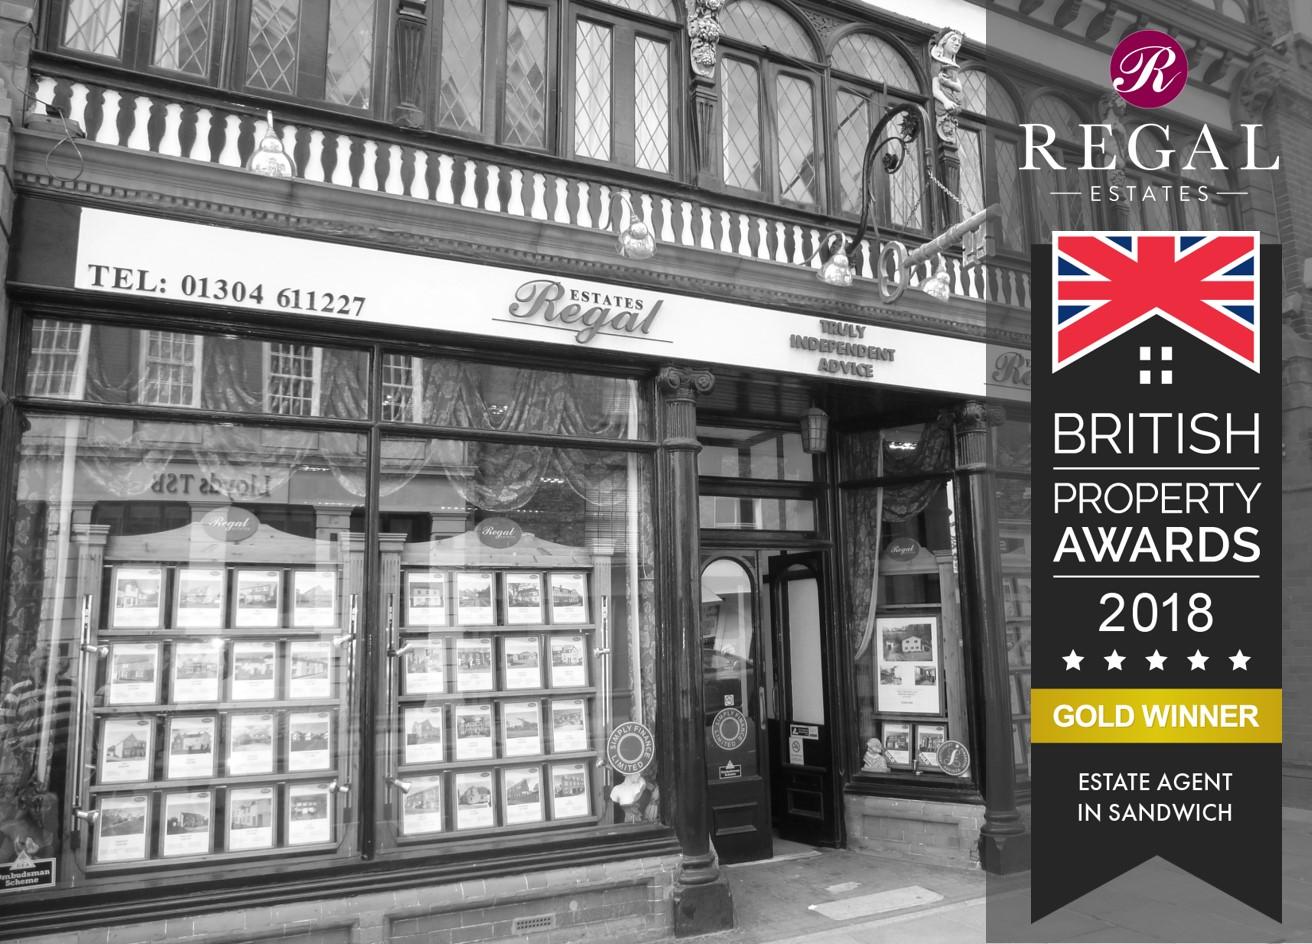 Sandwich Office Wins 'British Property Awards' 2nd Year Running!